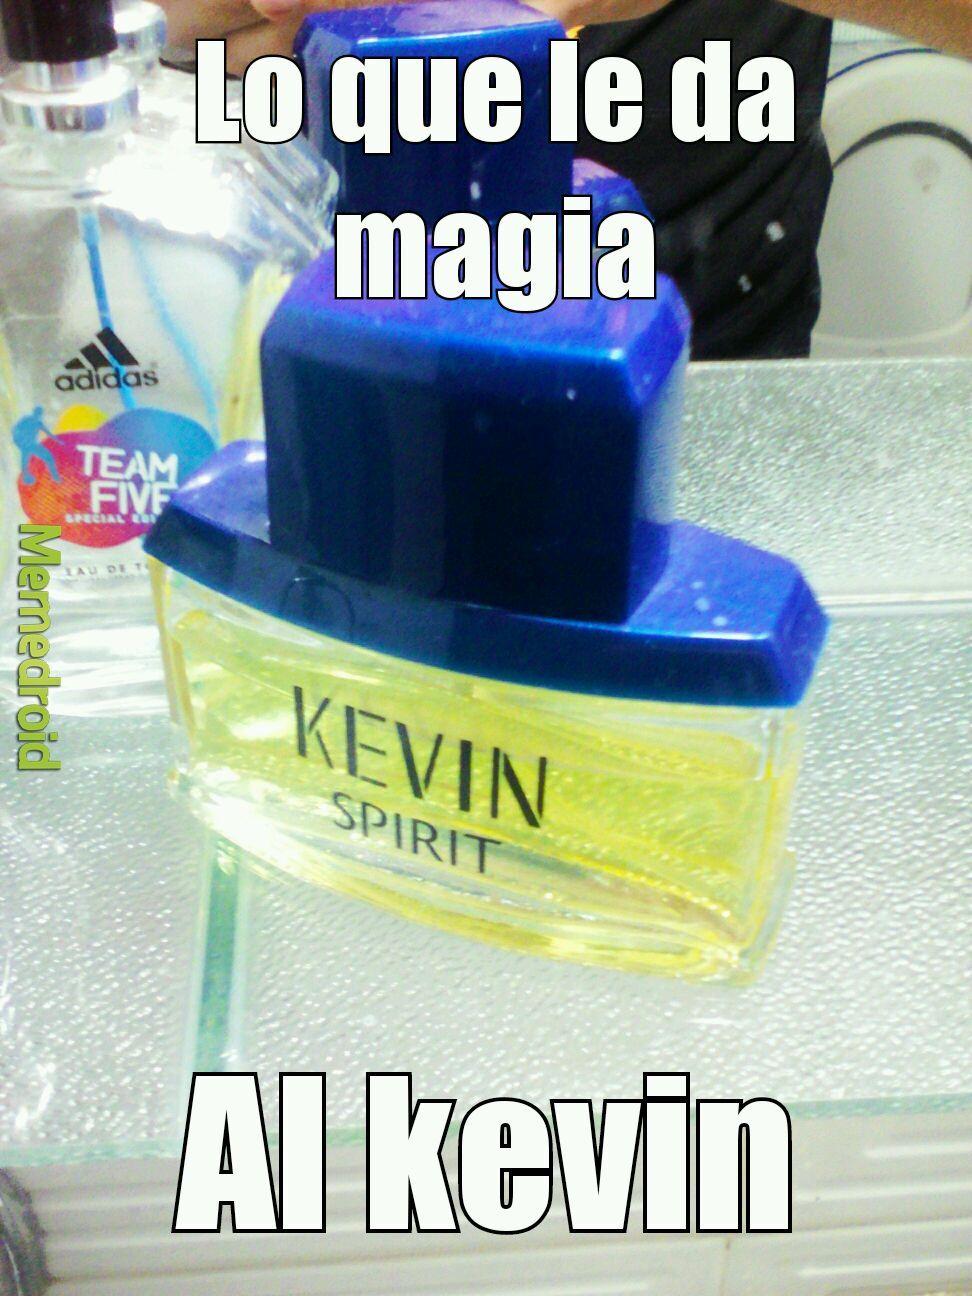 Kevin spirit :v - meme